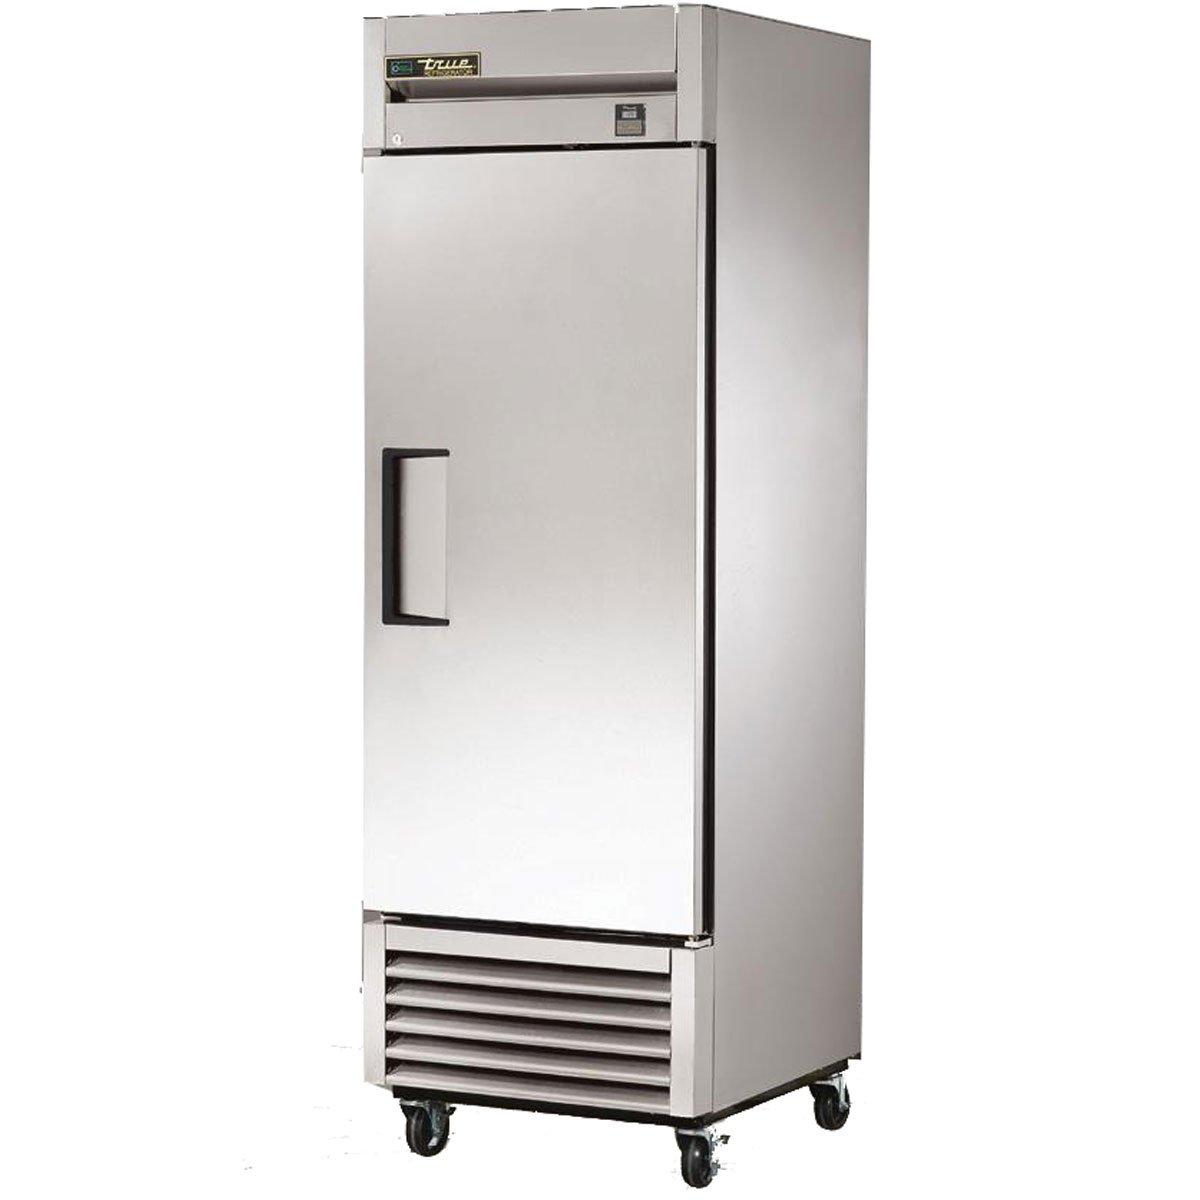 Image of True T-23F-HC 1 Door Freezer with Hydrocarbon Refrigerant